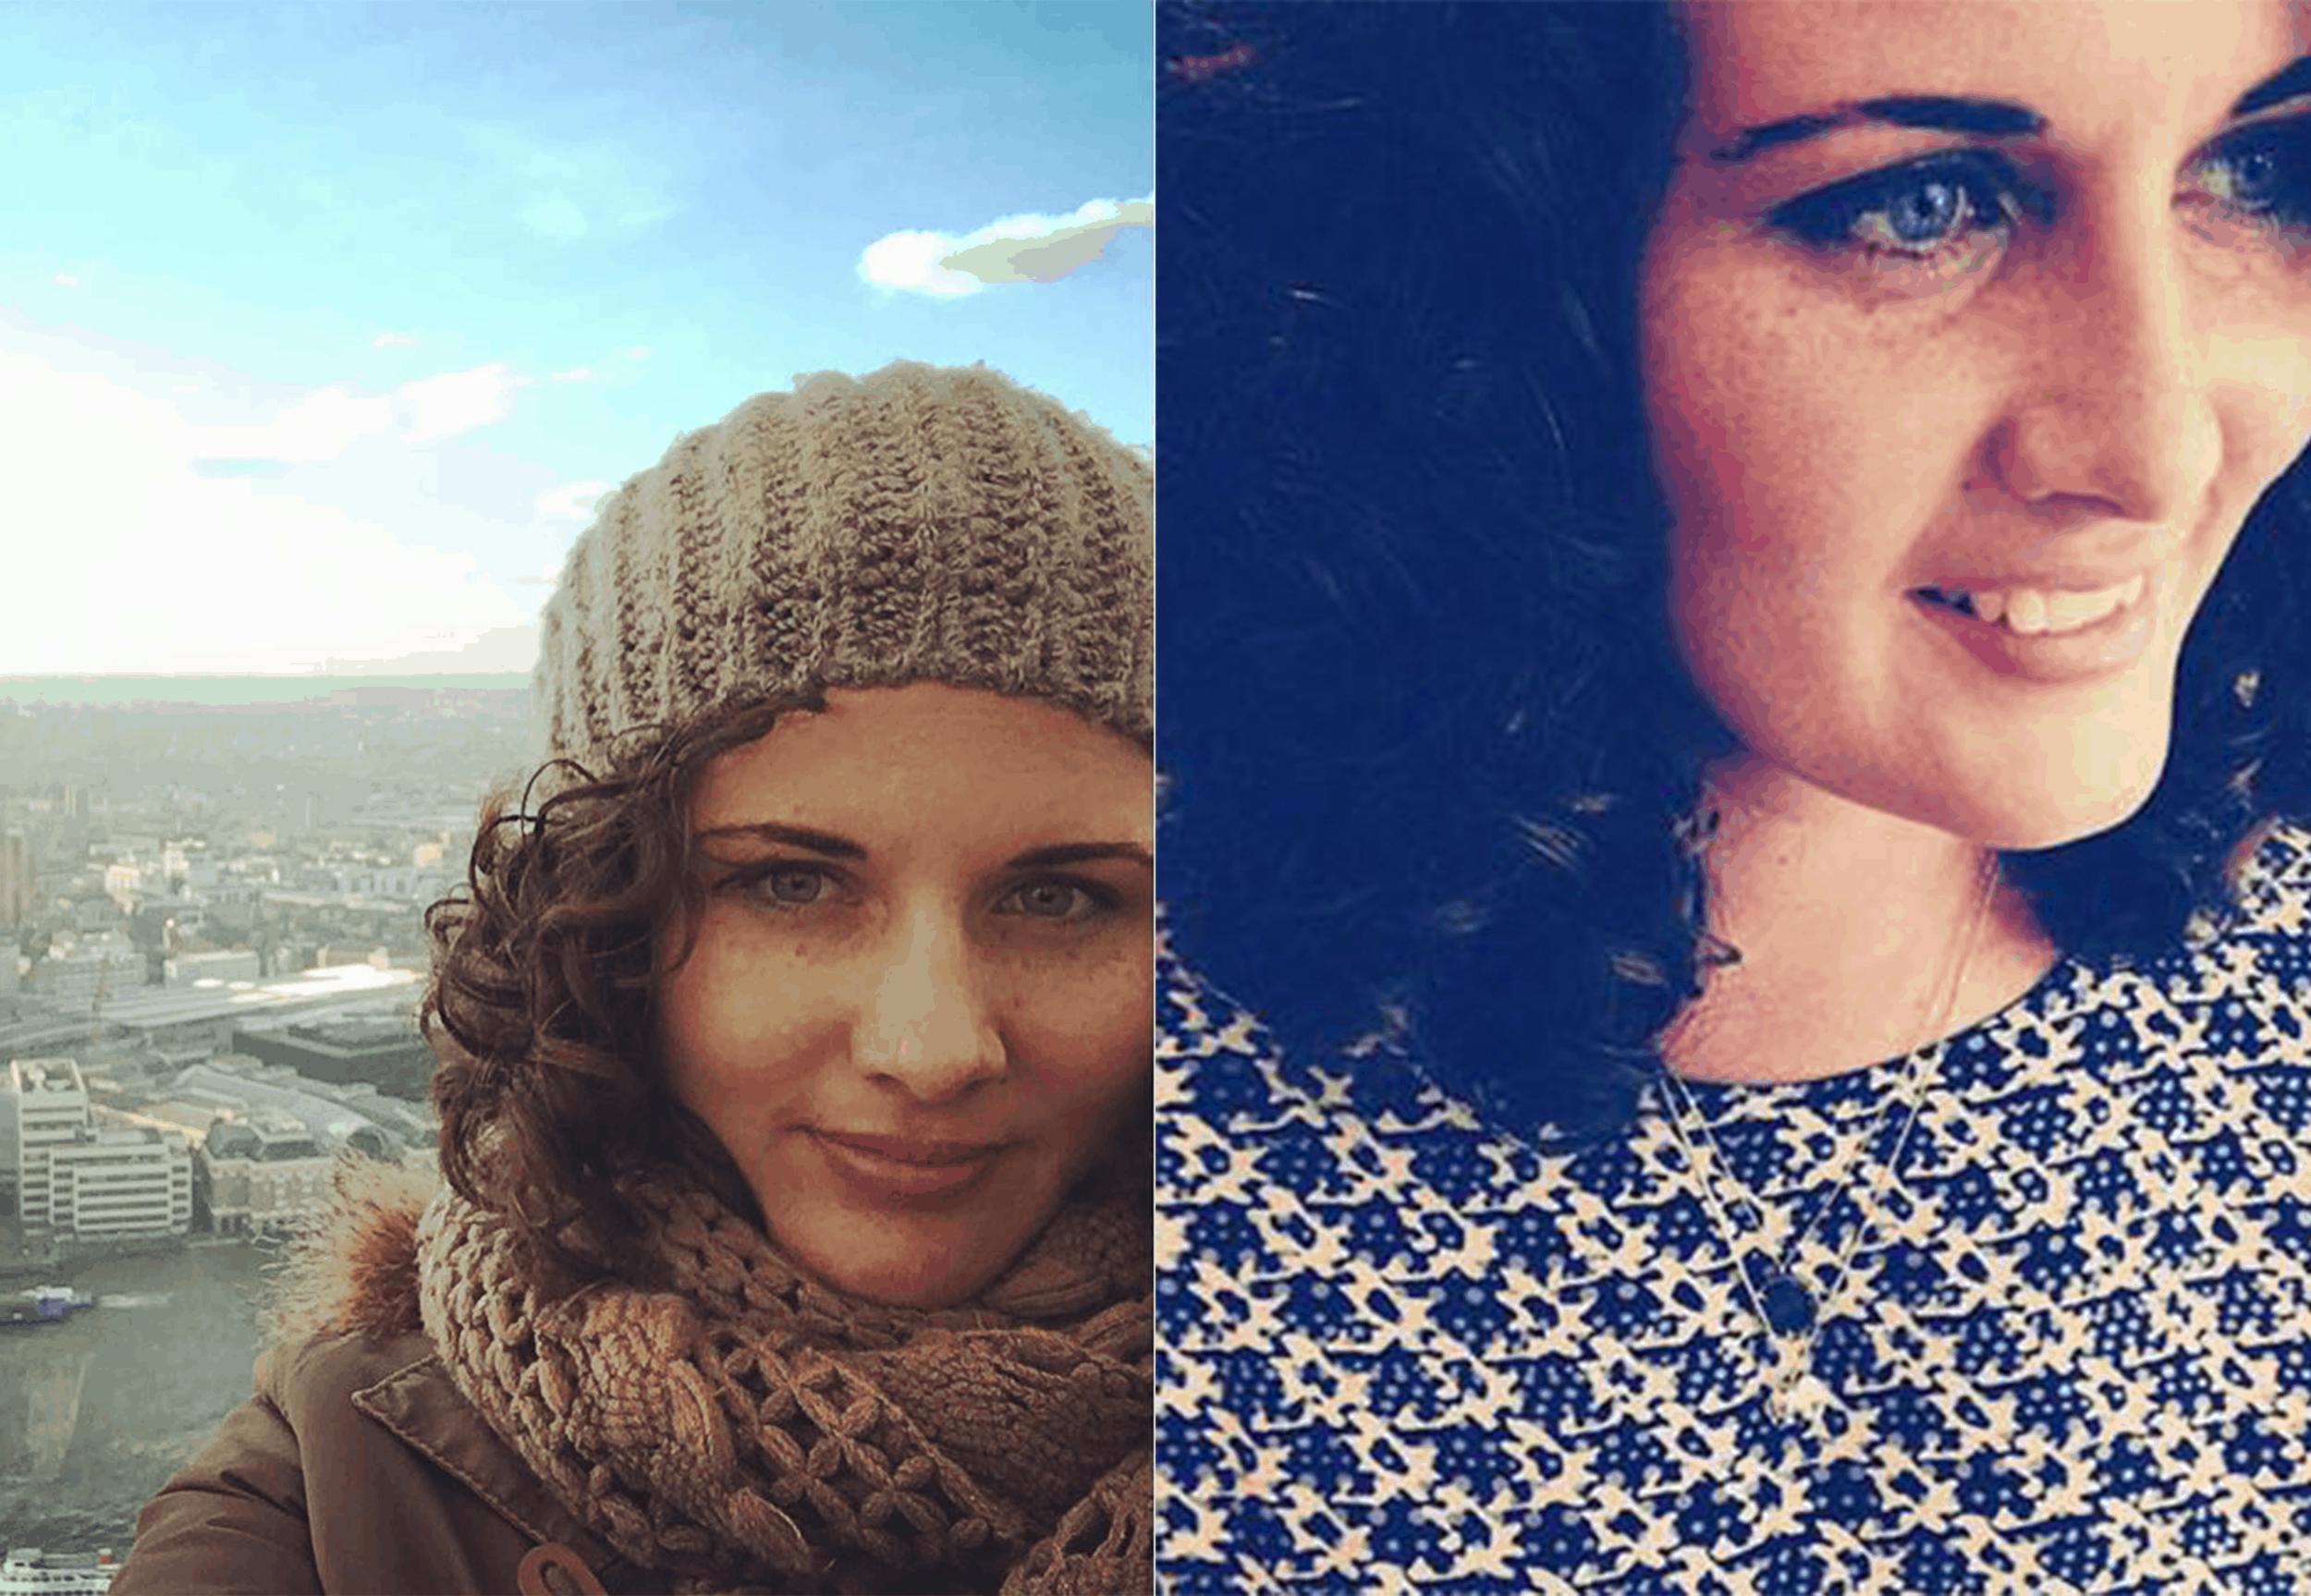 Women of Google: Shiloh Gulickson